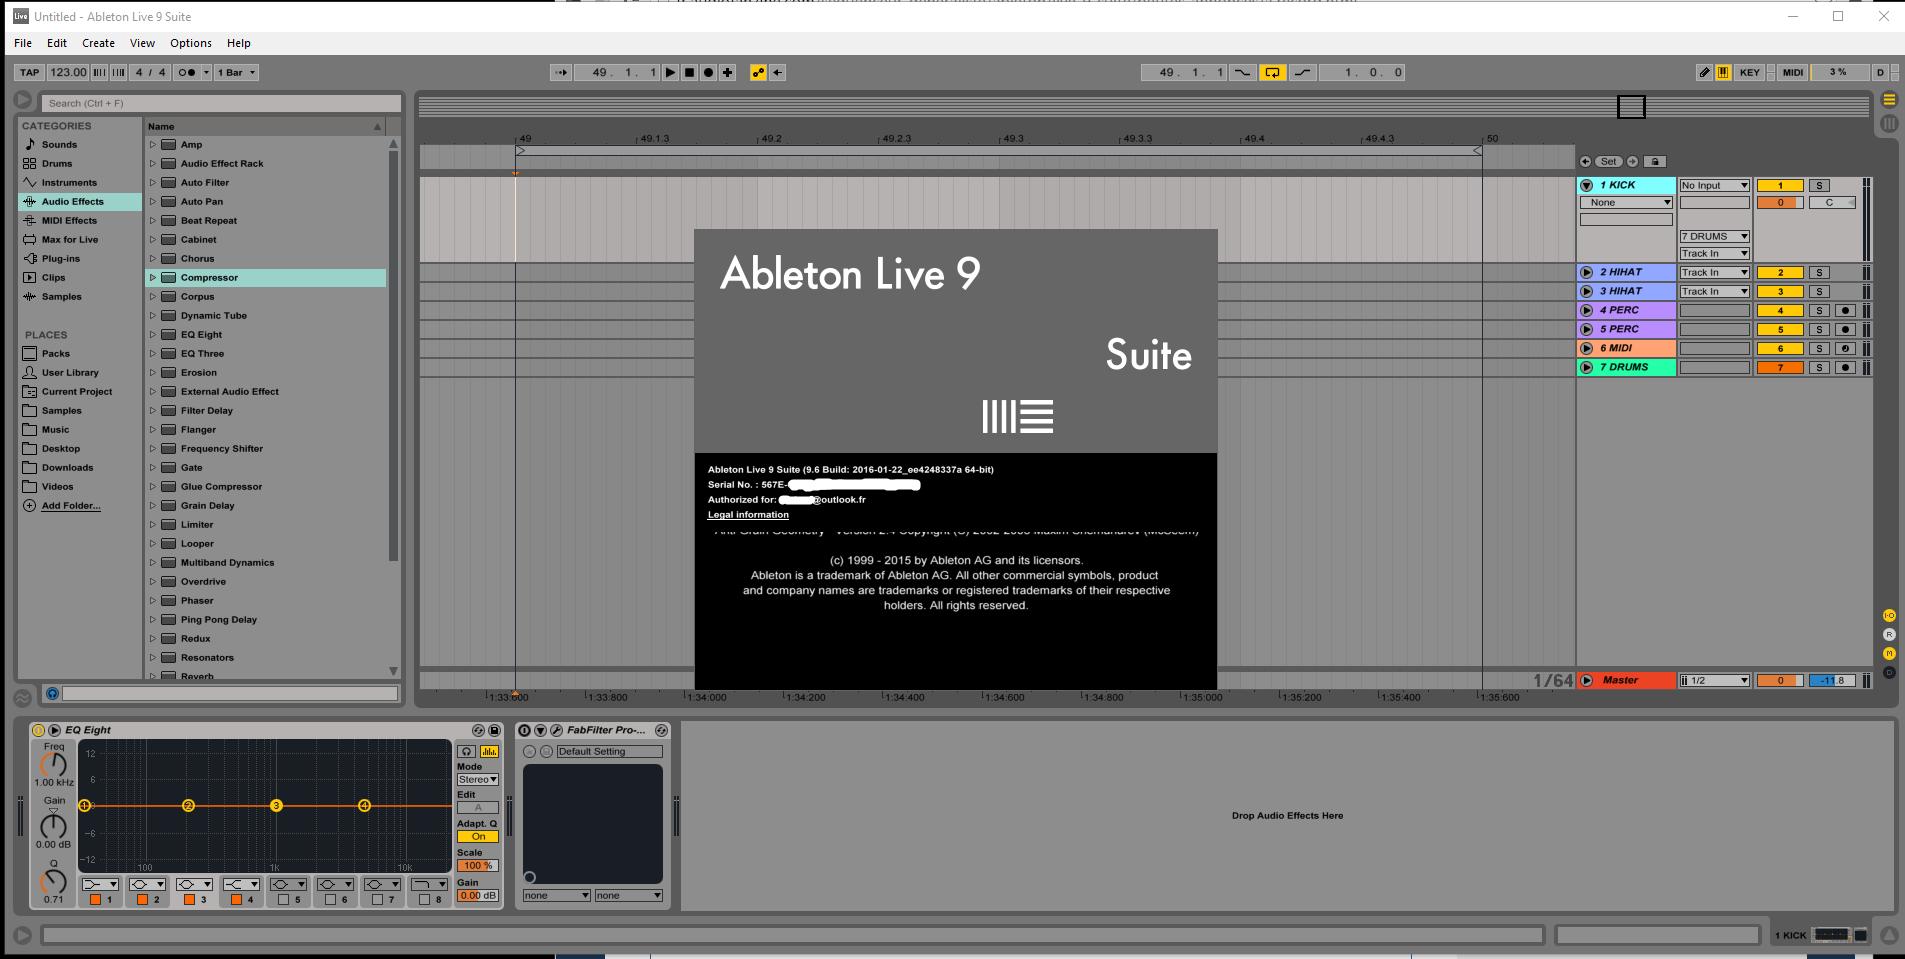 ableton live 9 crack mac 64 bit torrent